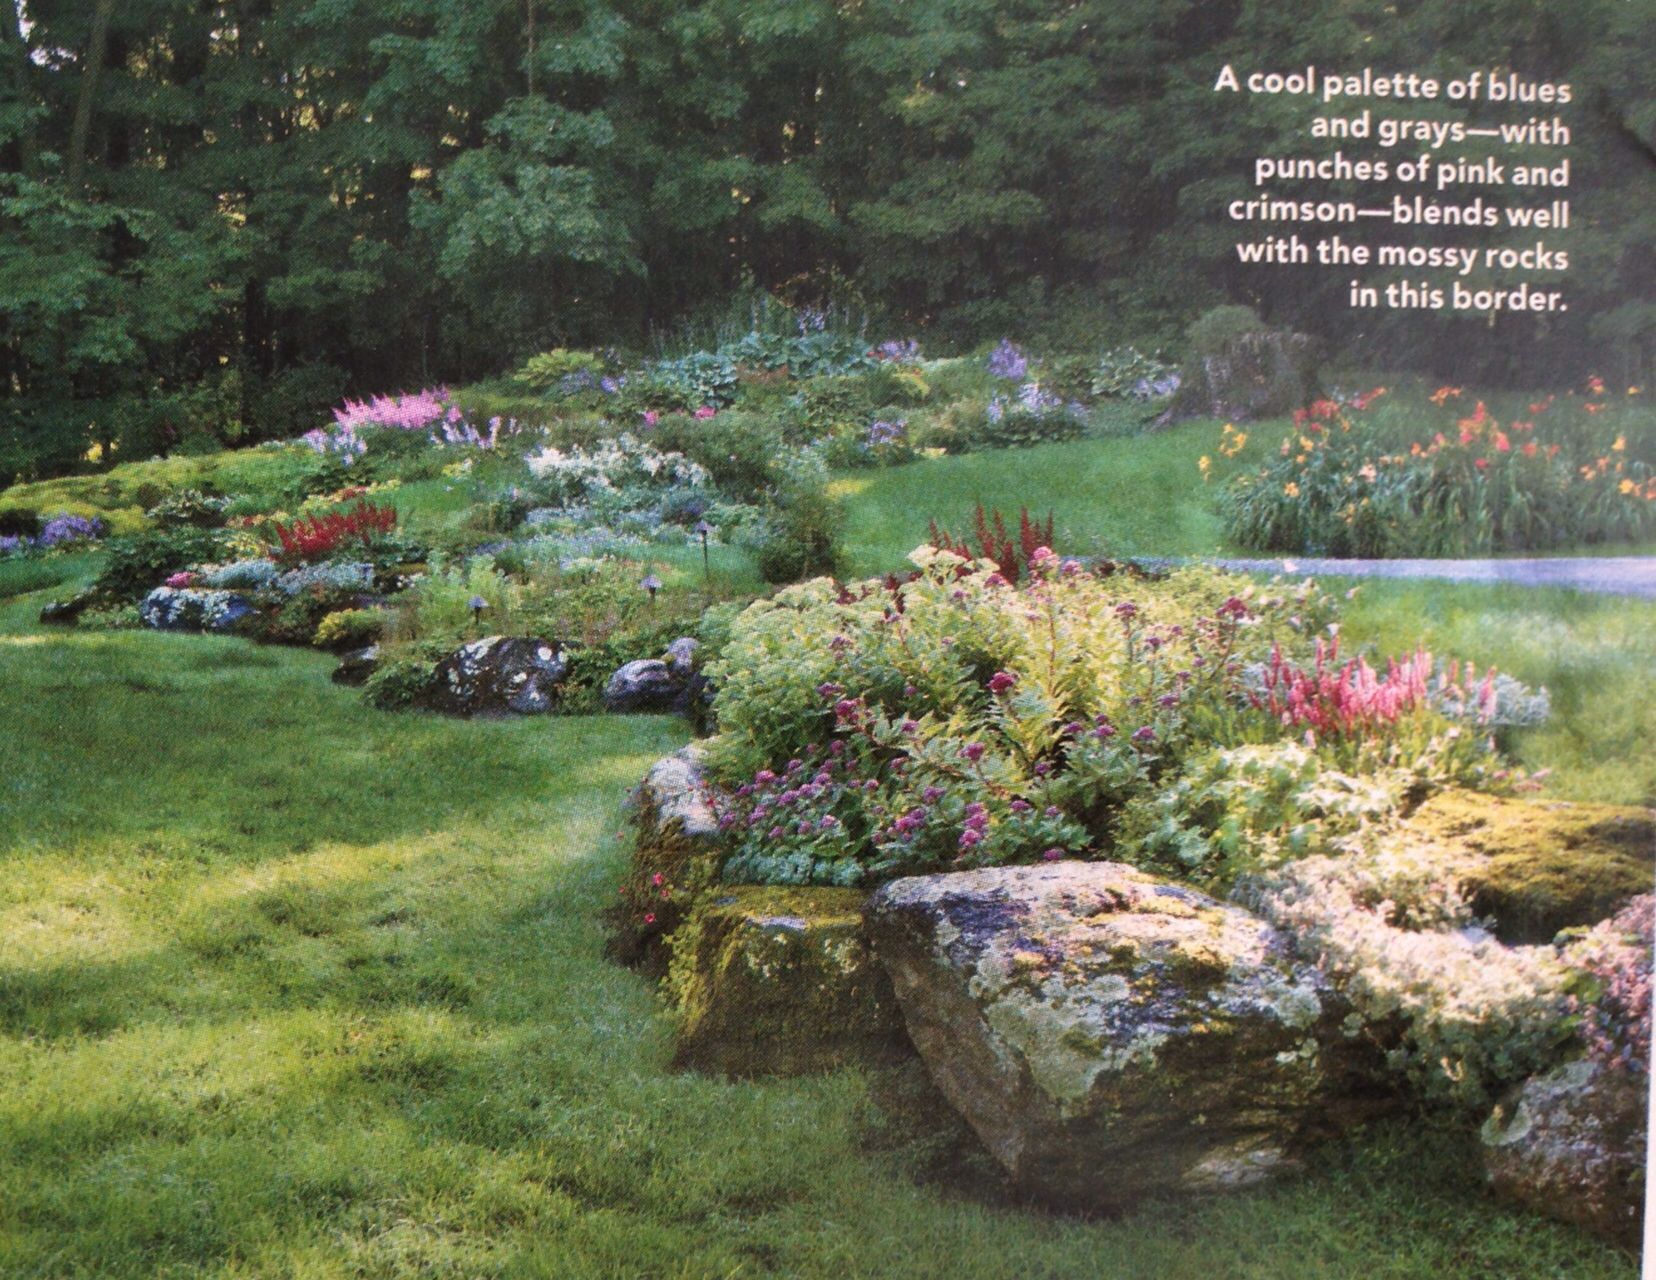 Elegant Rocks for Garden Beds